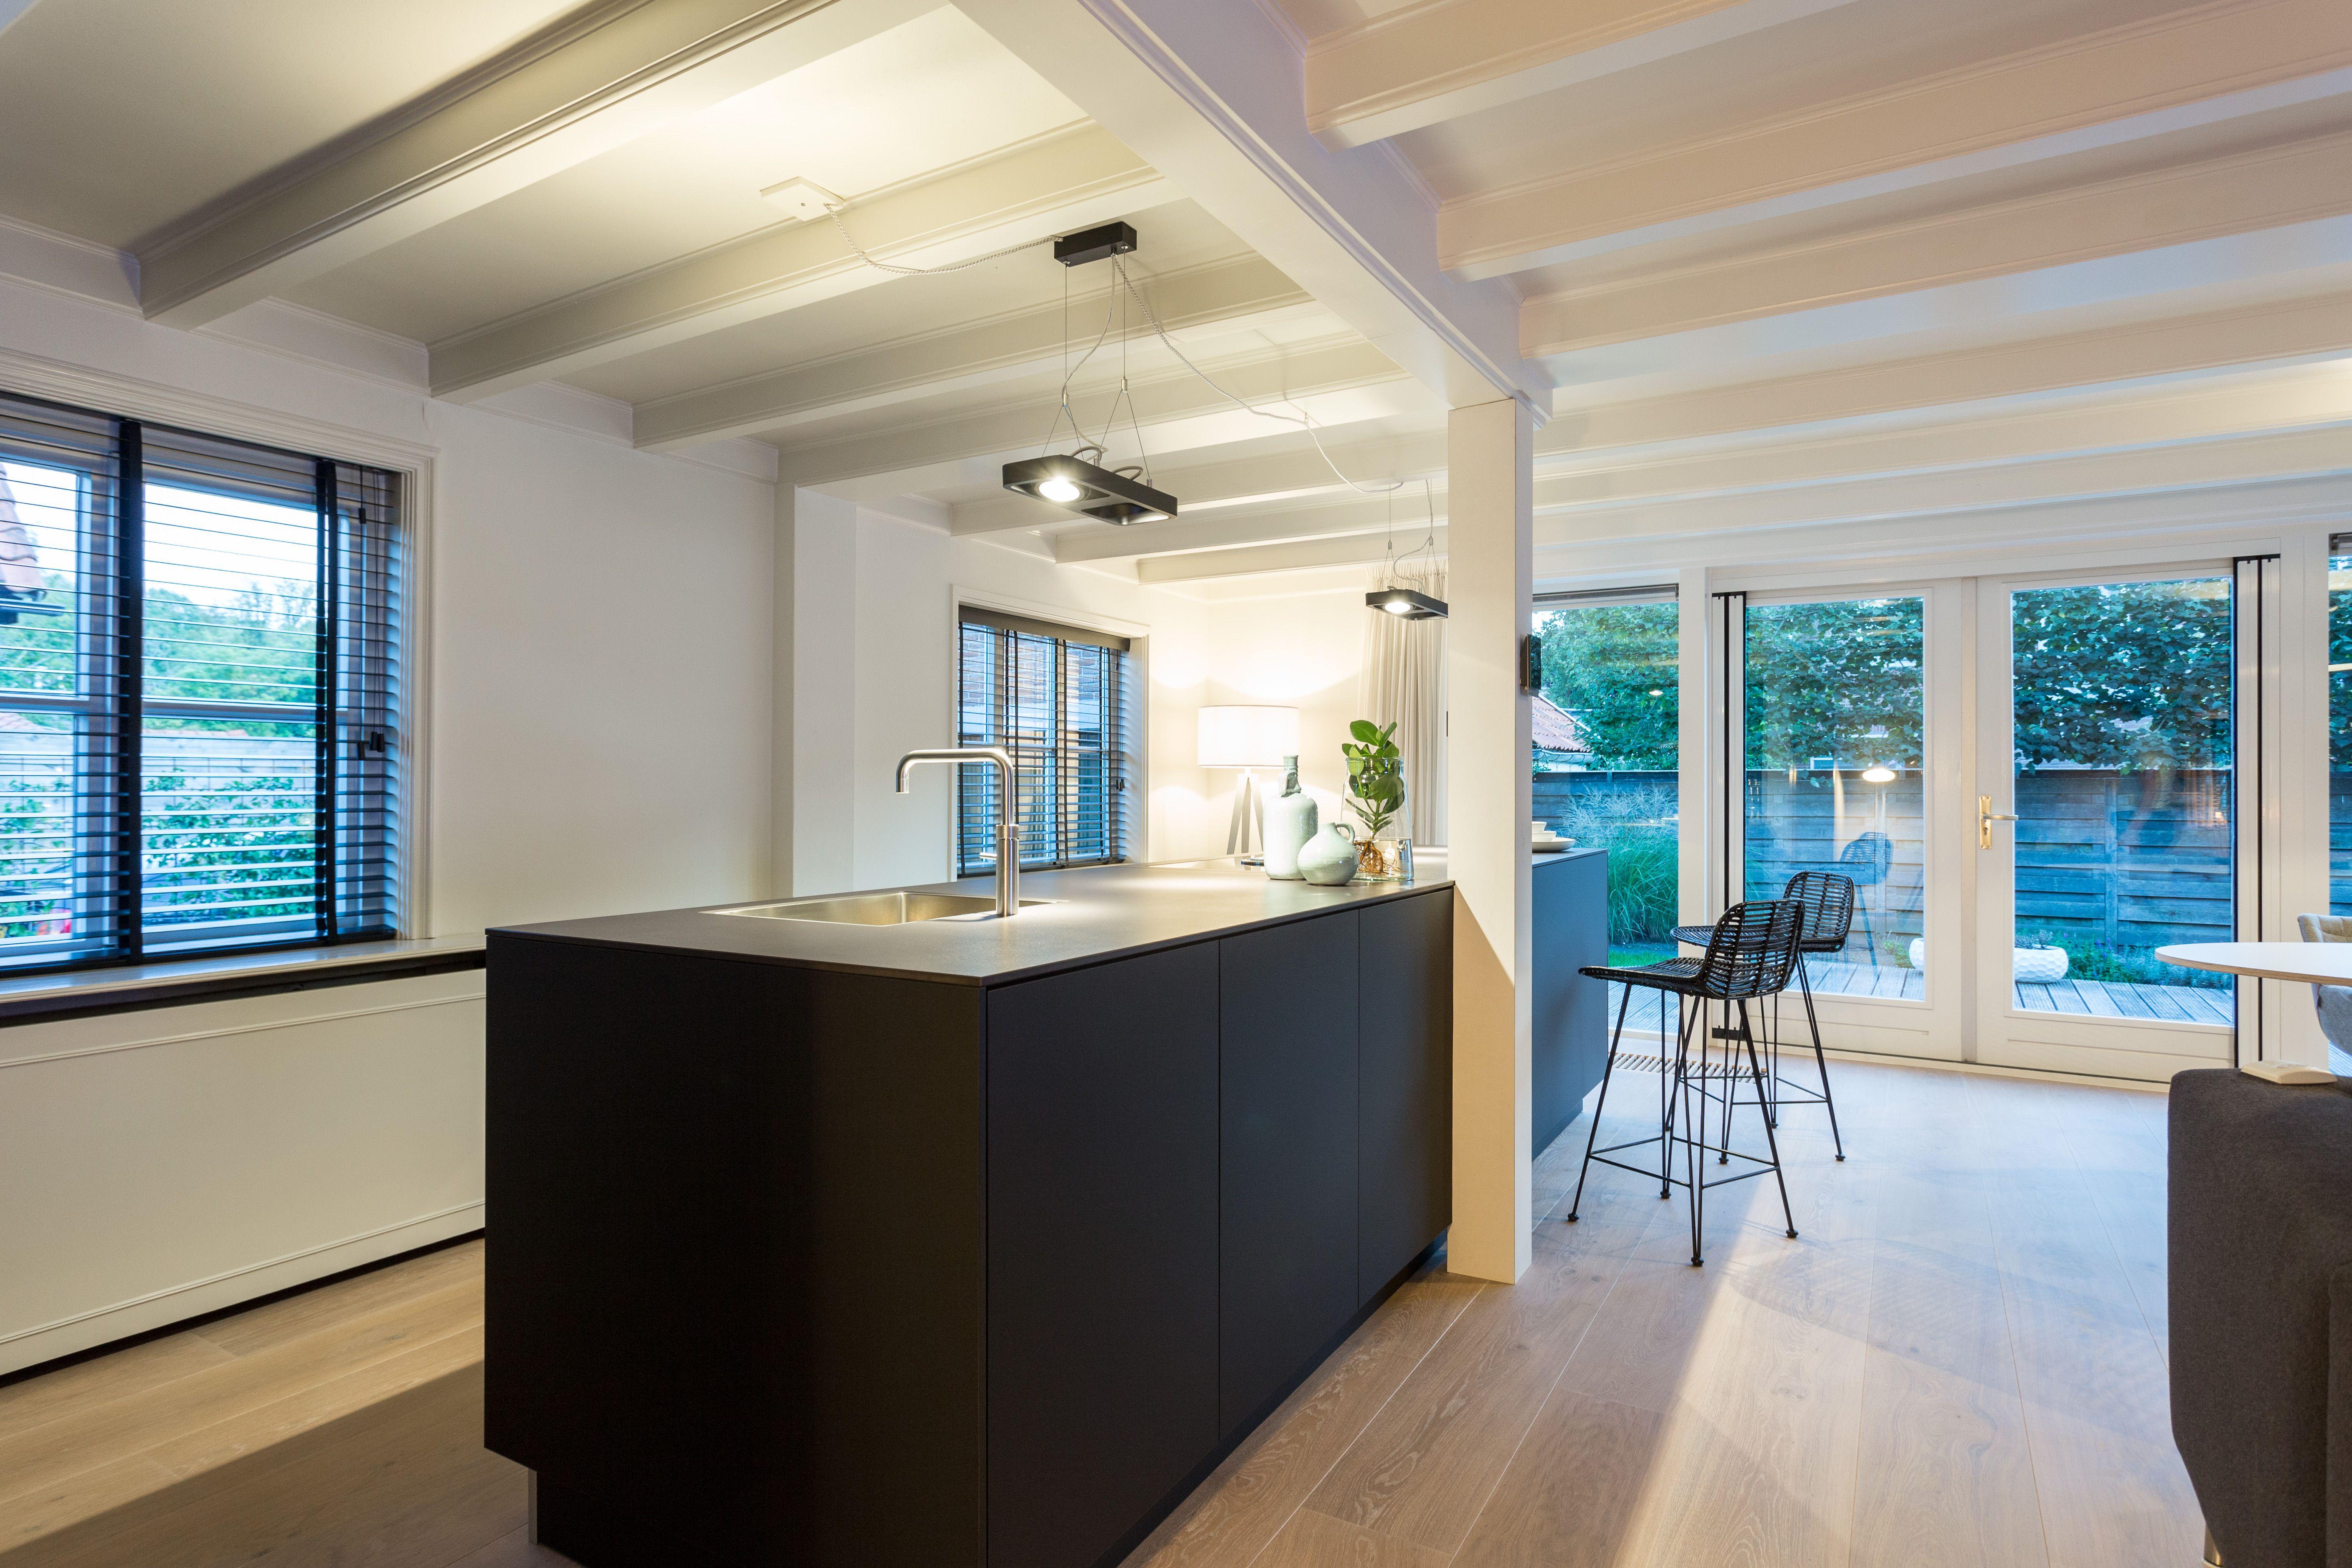 Black Fenix BAX Kitchen With A Black Dekton Worktop.